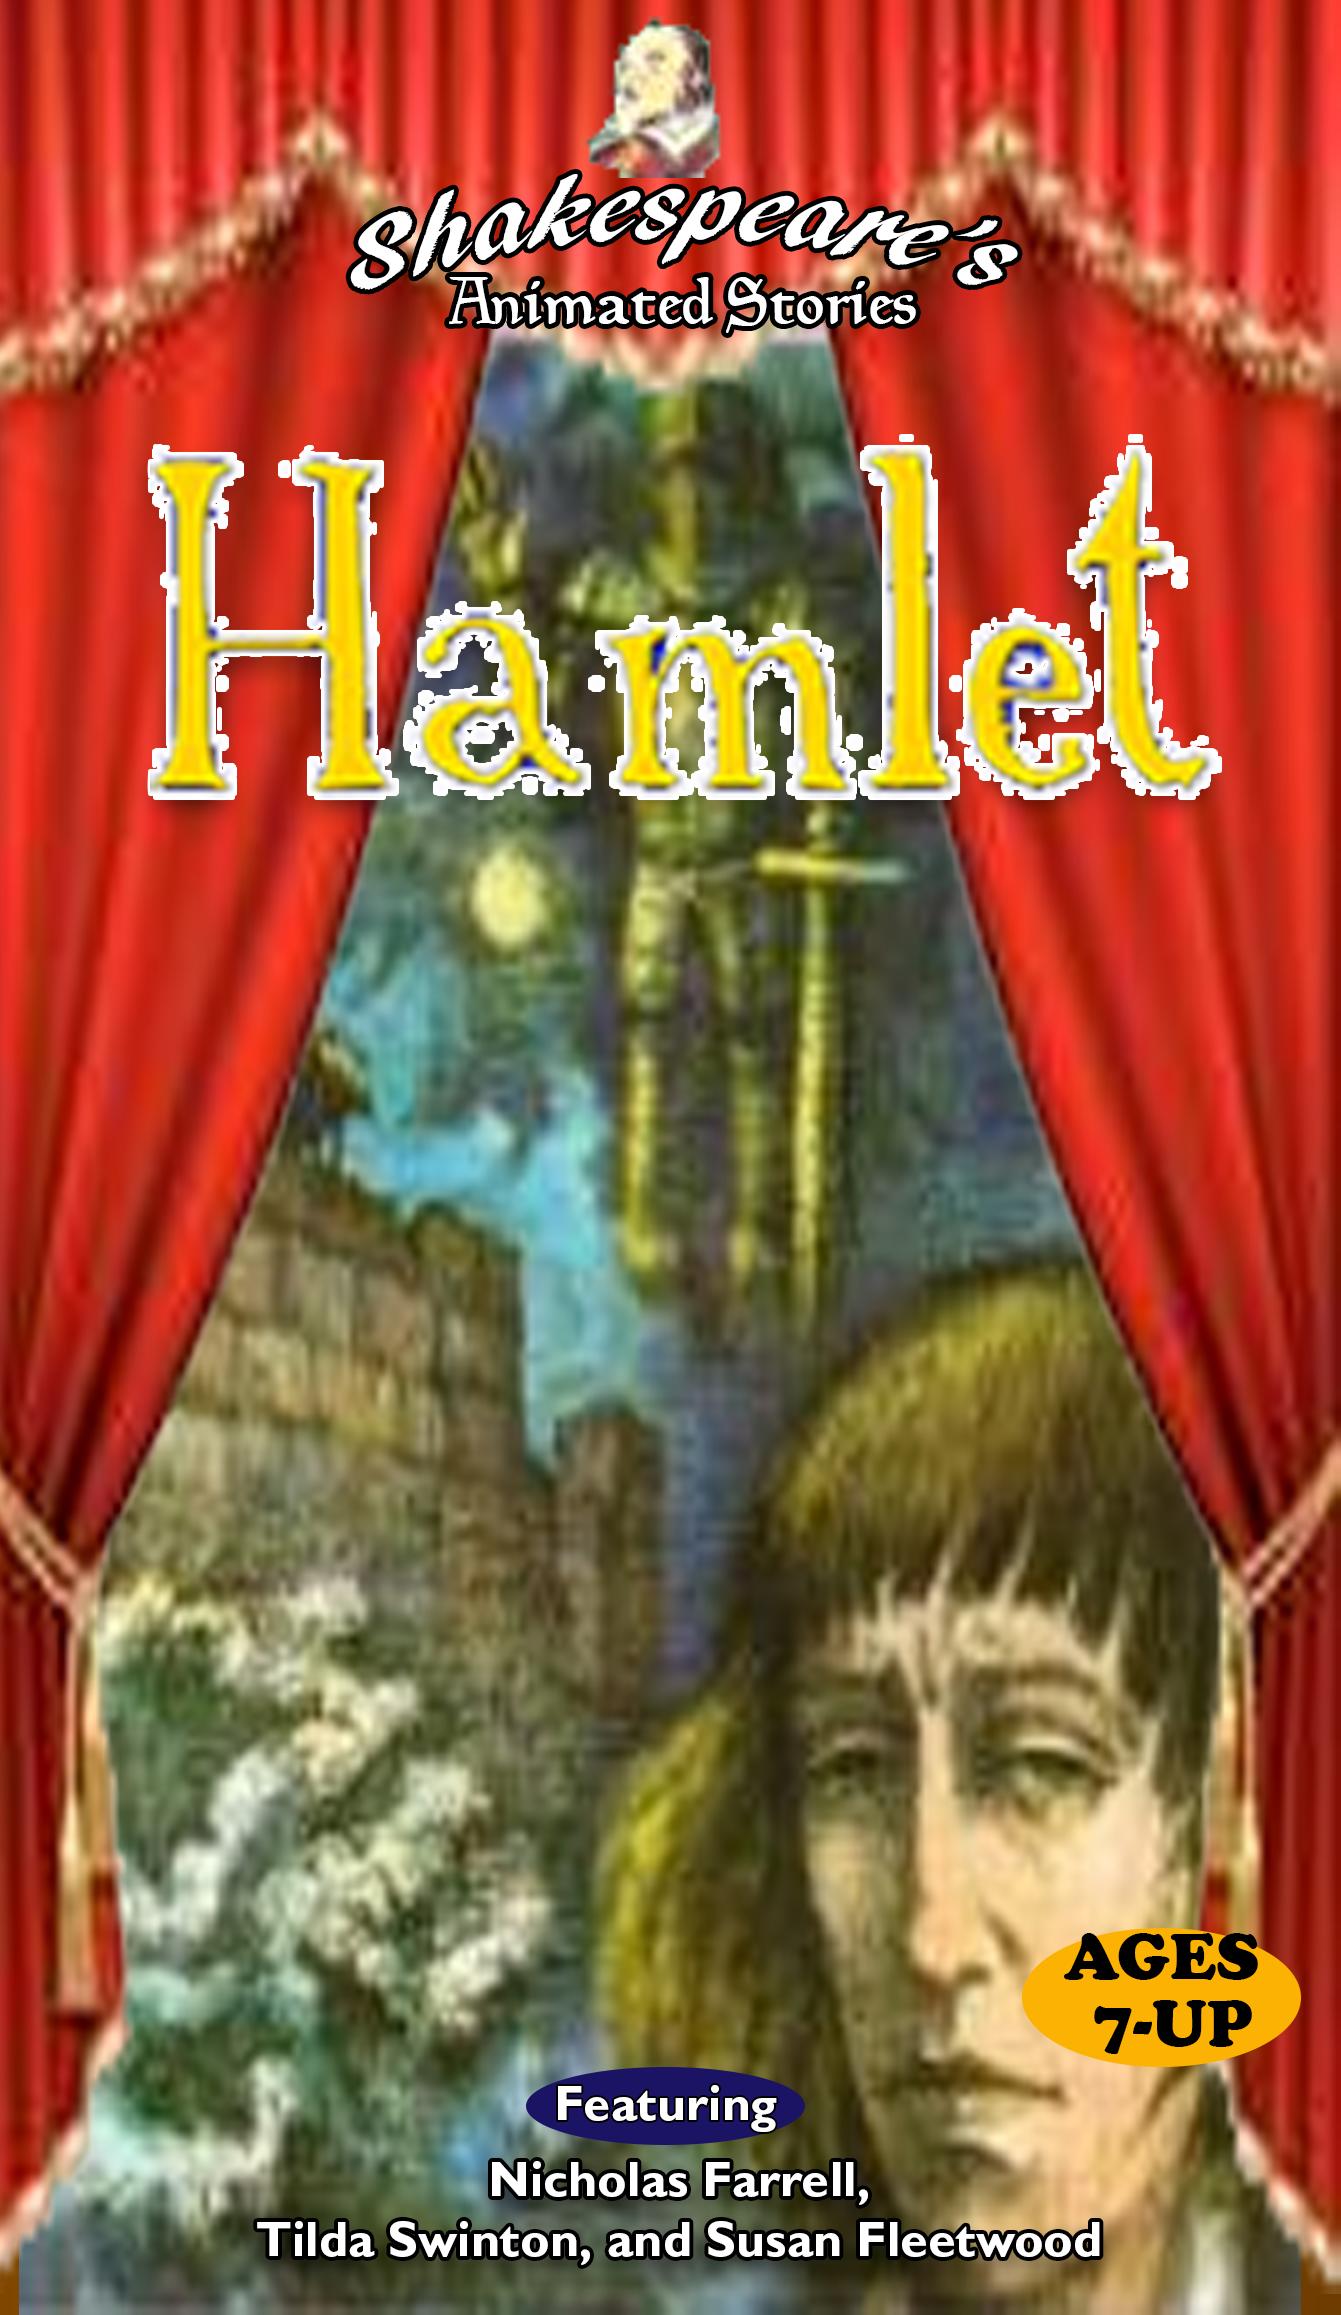 Shakespeare's Animated Stories: Hamlet (1997 VHS)